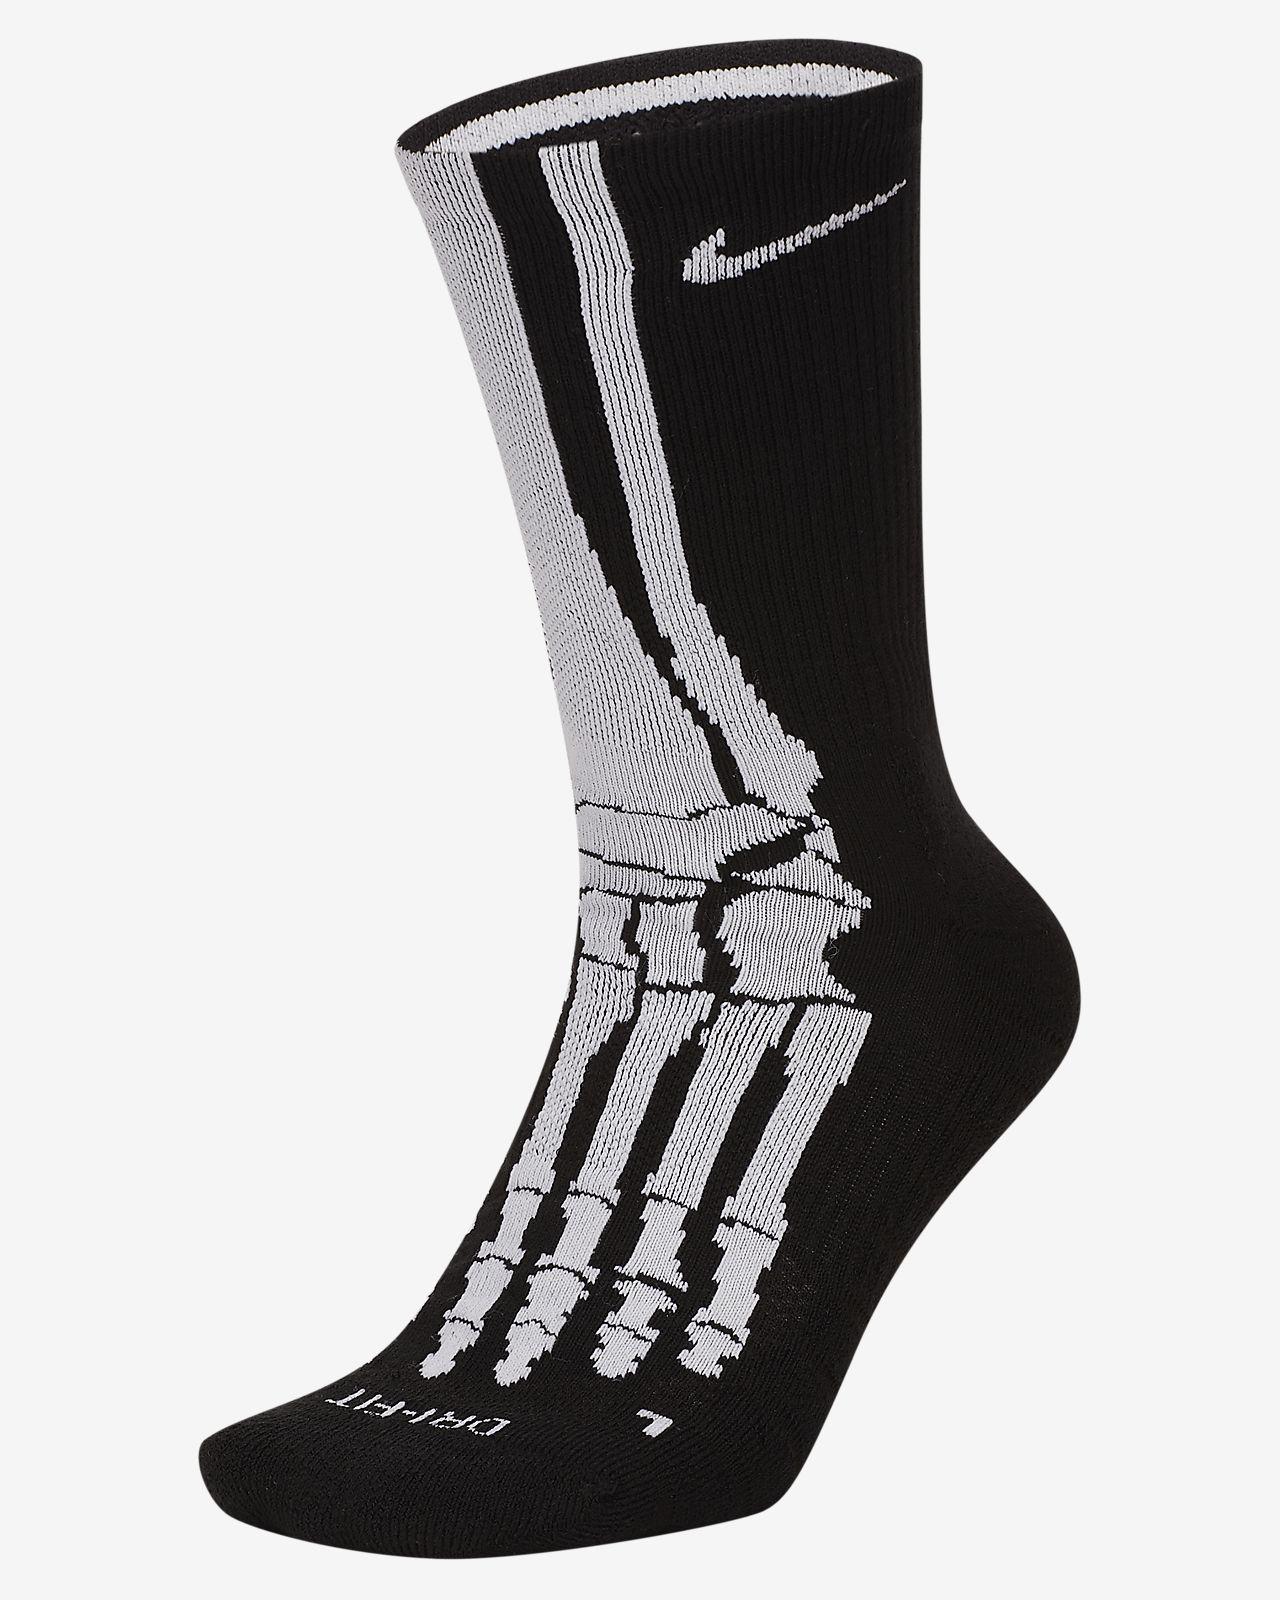 Nike Everyday Plus Skeleton Training Crew Socks